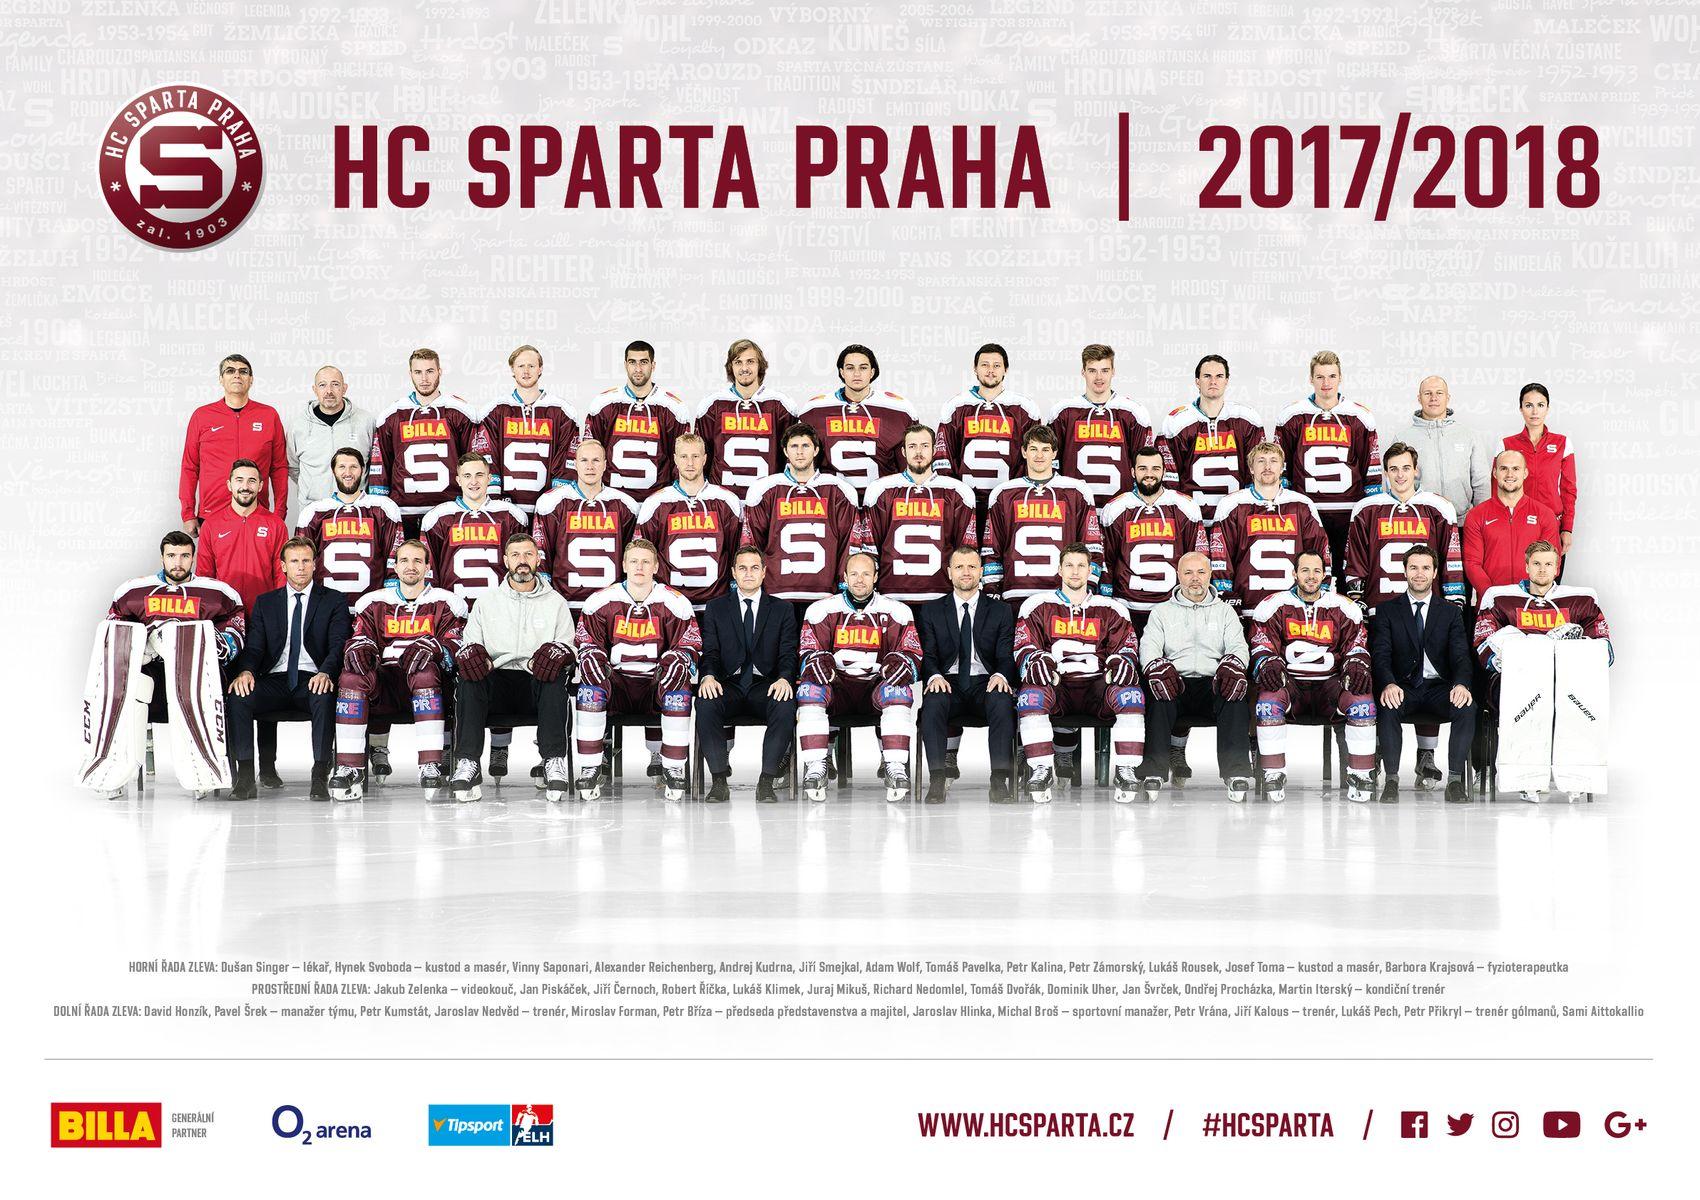 hc sparta